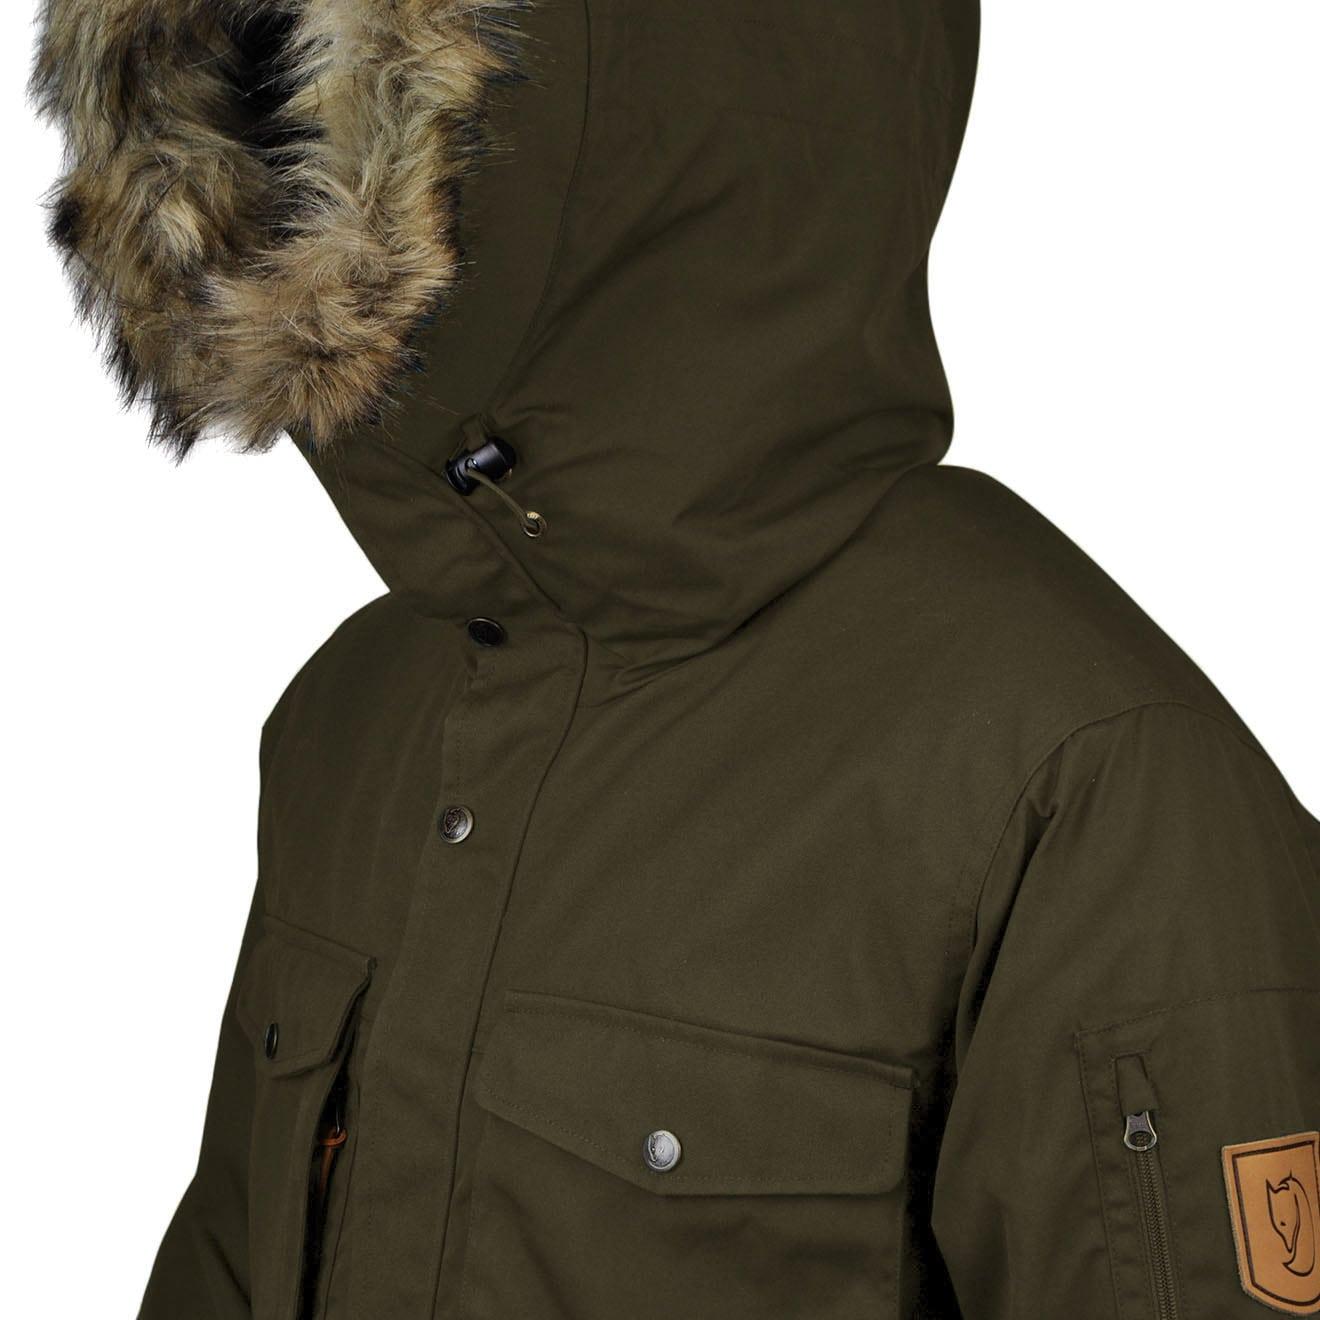 new list best place wholesale online Fjallraven Singi Winter Jacket Dark Olive - The Sporting Lodge